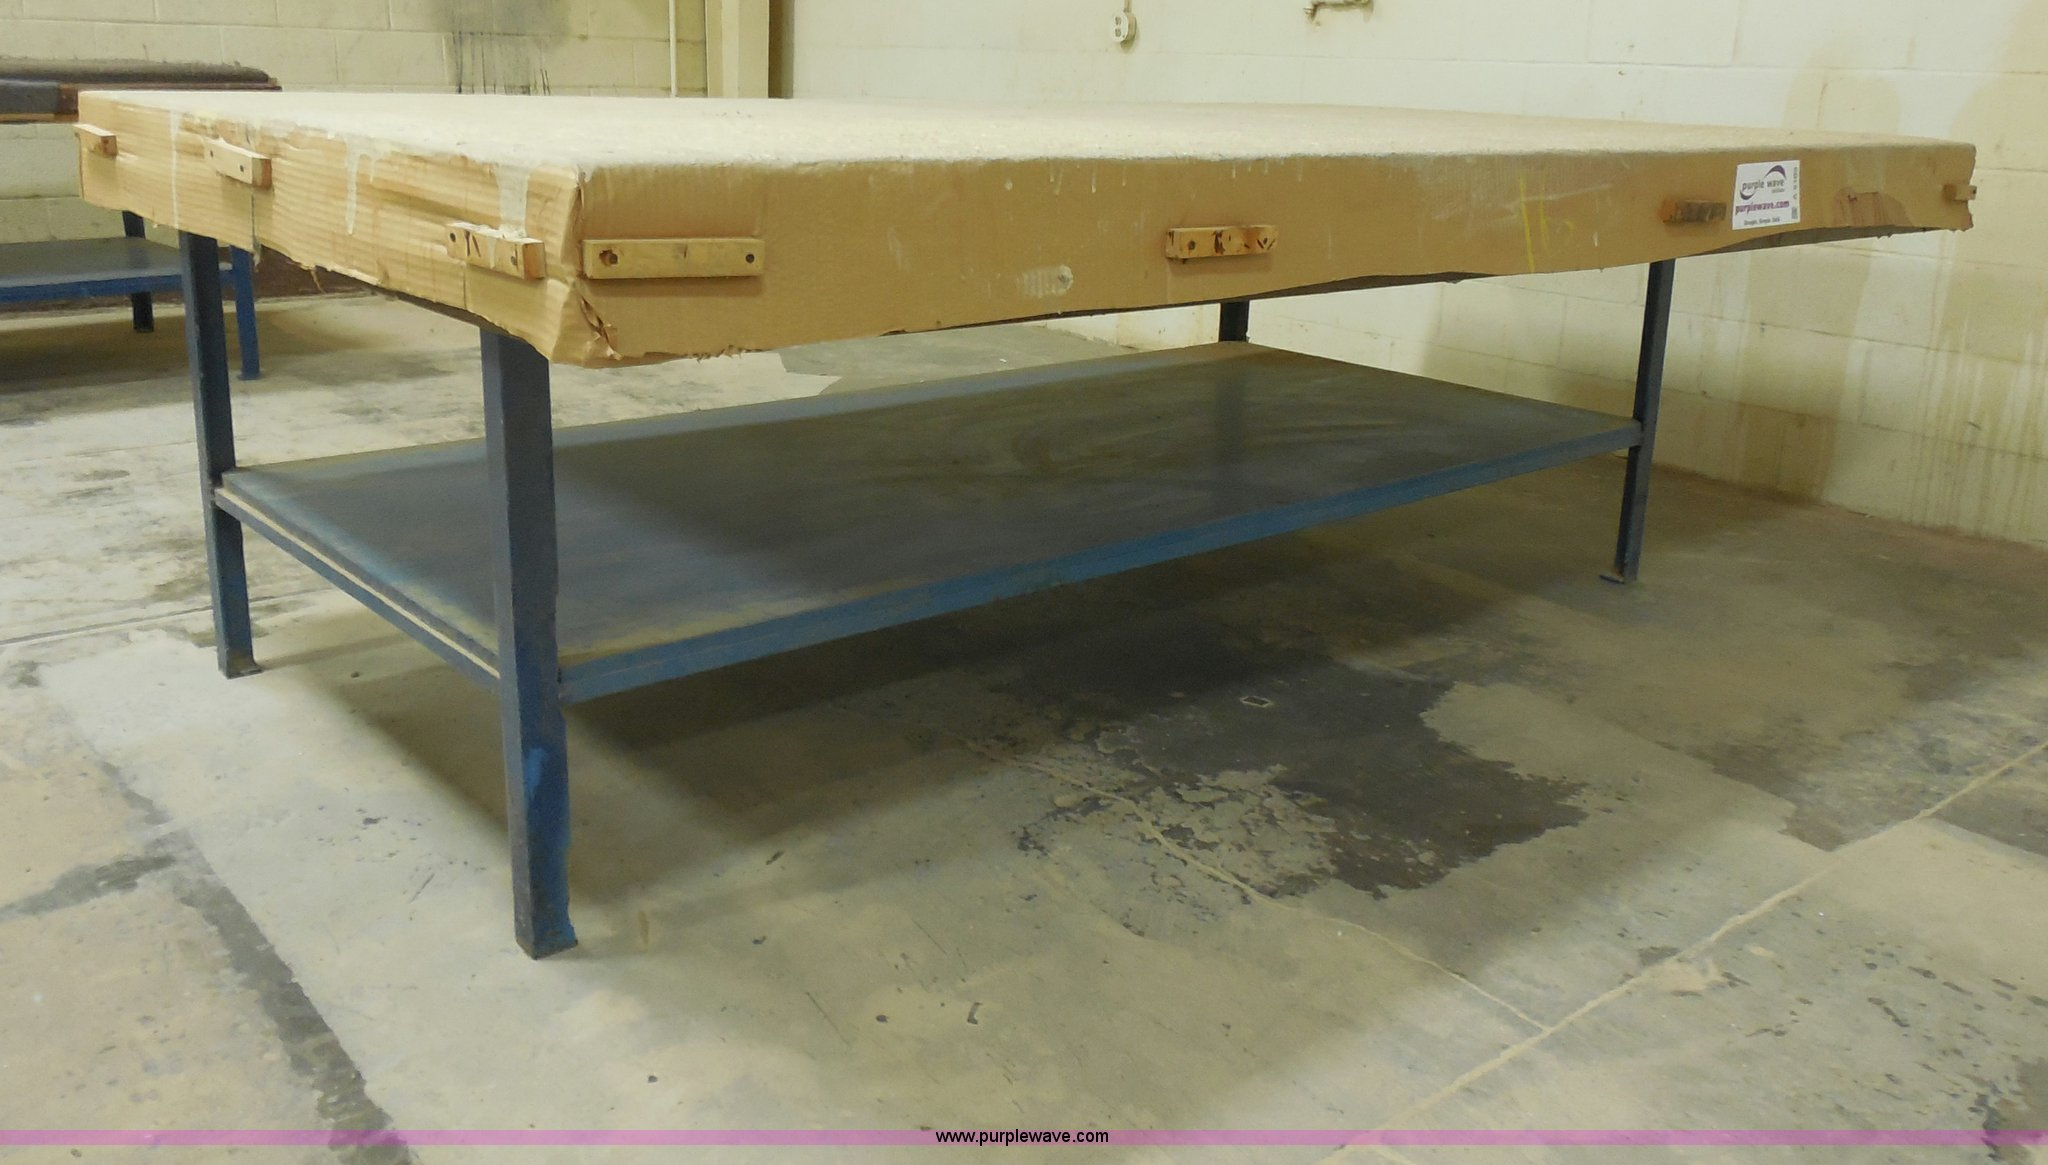 Superb Work Bench Item A5109 Sold April 17 Midwest Auction P Beatyapartments Chair Design Images Beatyapartmentscom